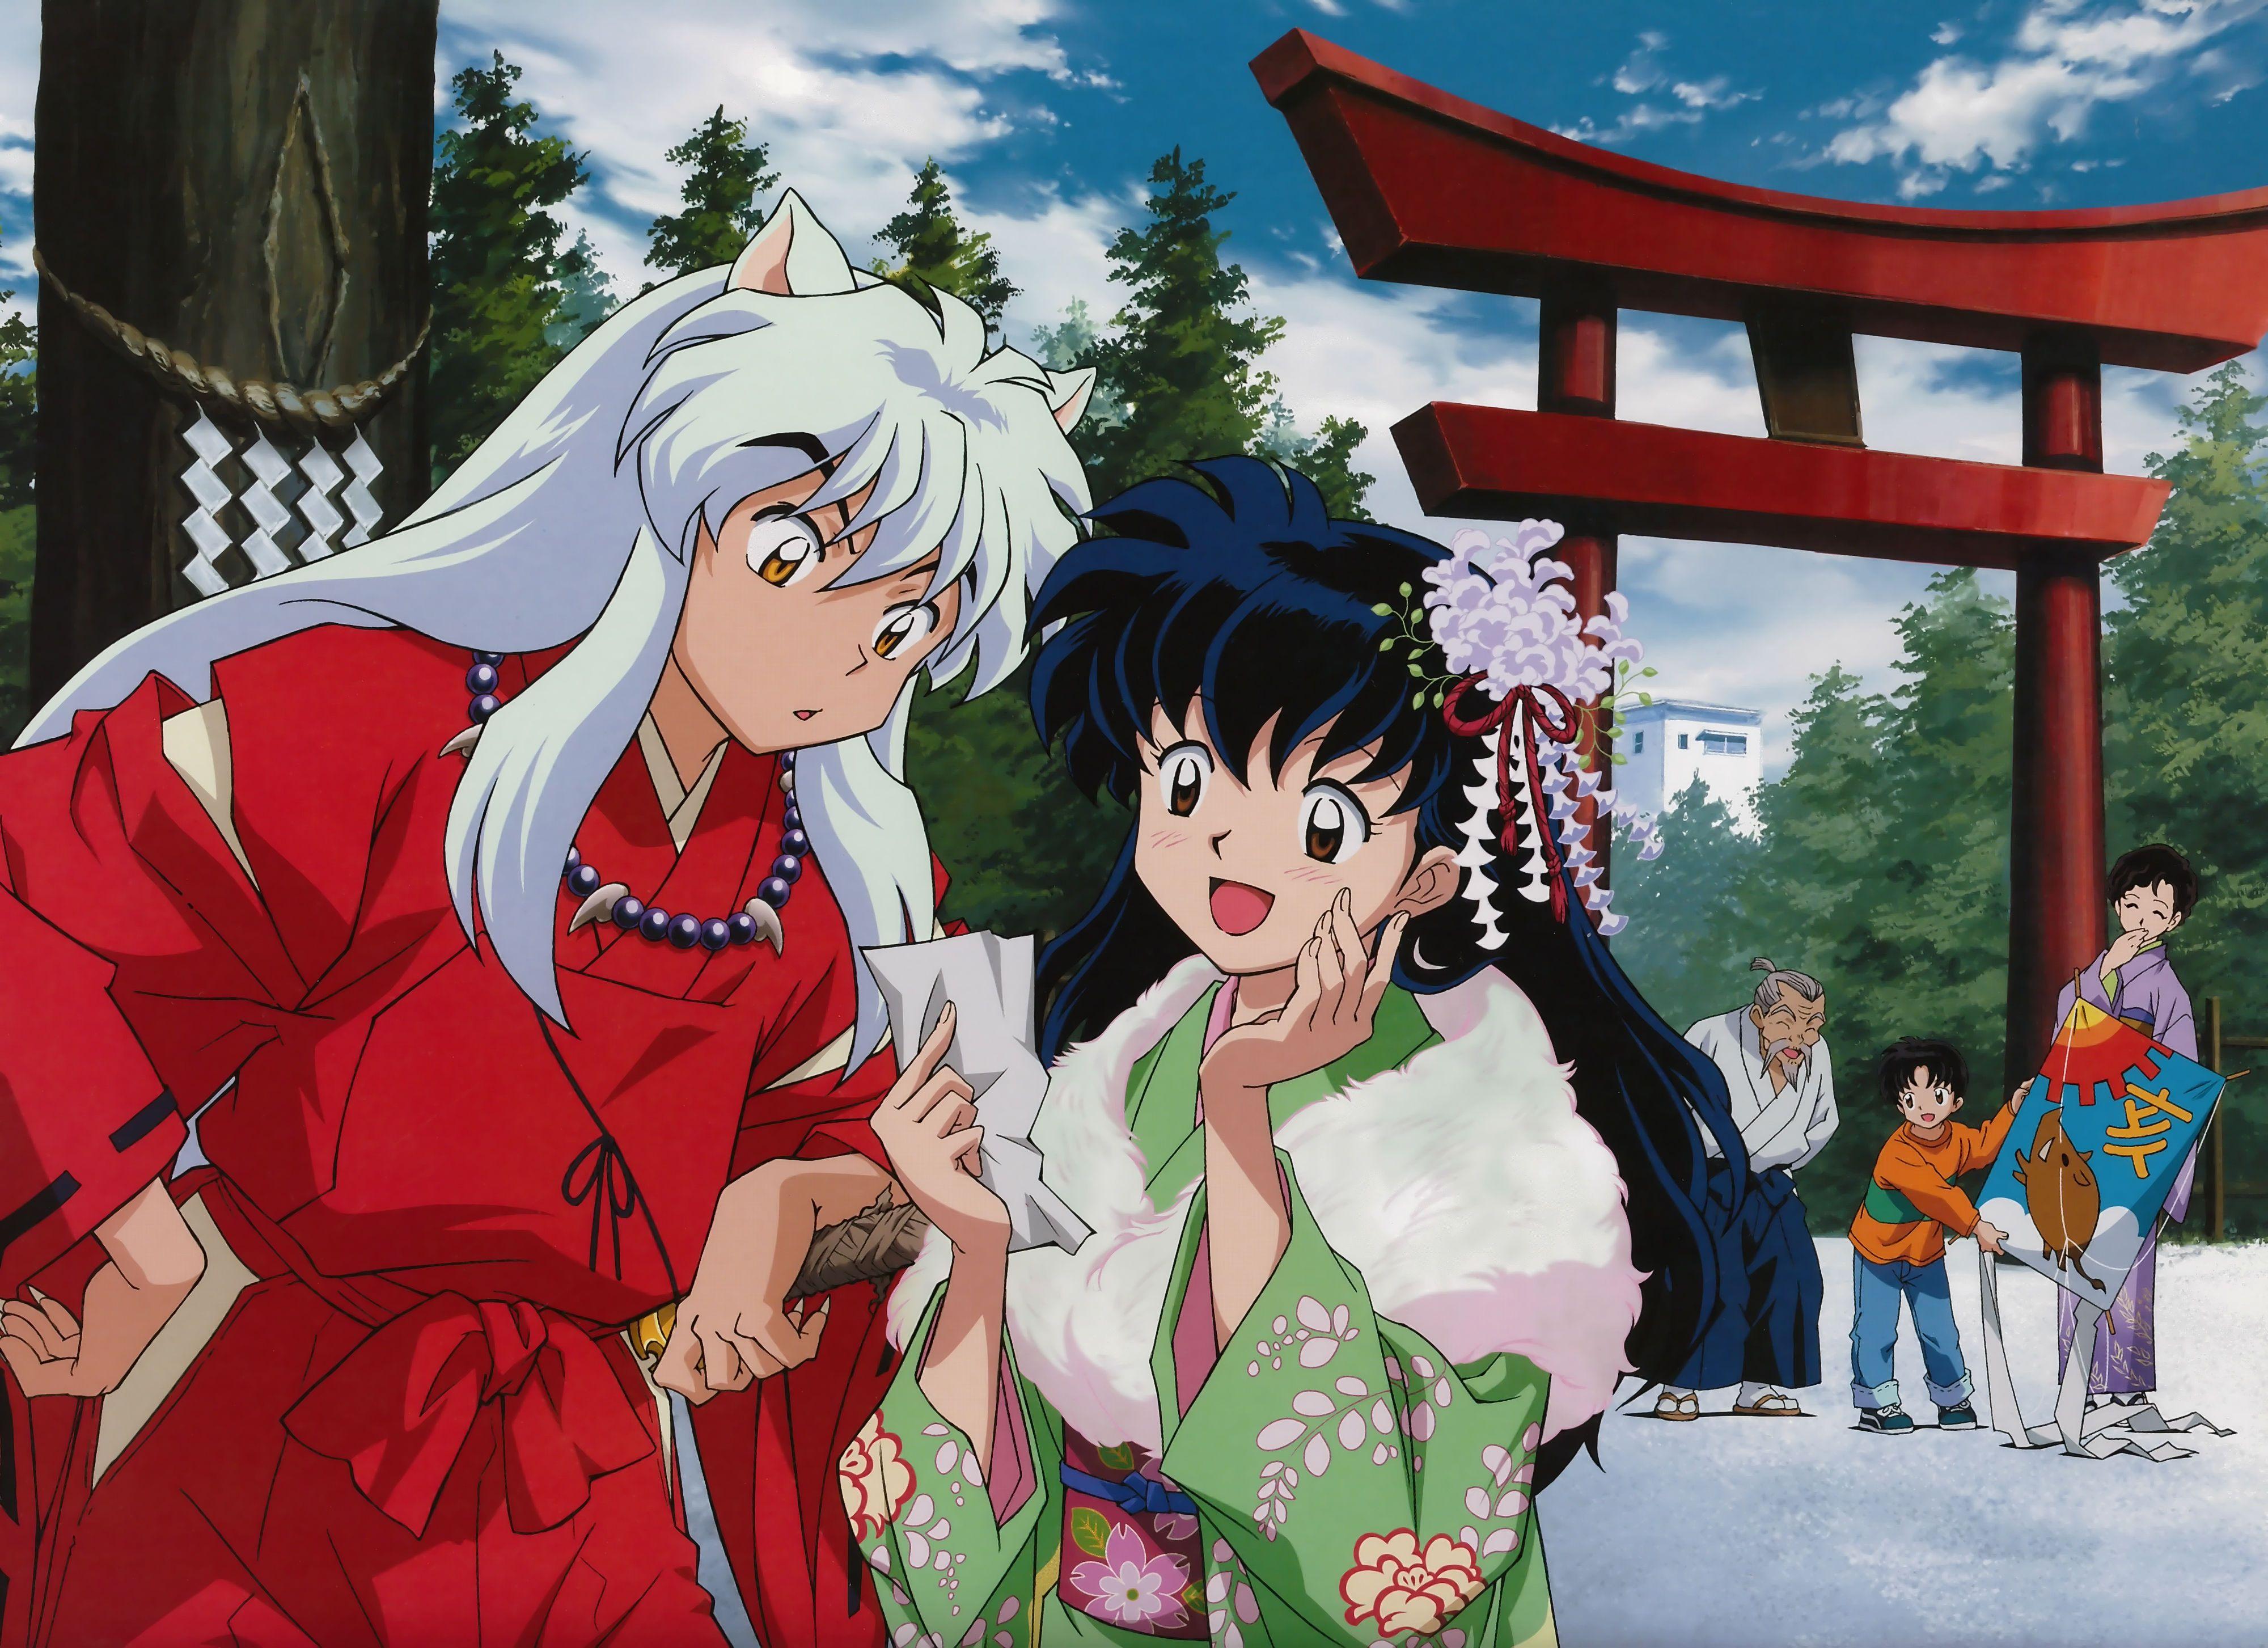 62 Inuyasha Hd Wallpapers Backgrounds Wallpaper Abyss Inuyasha Anime Kagome And Inuyasha